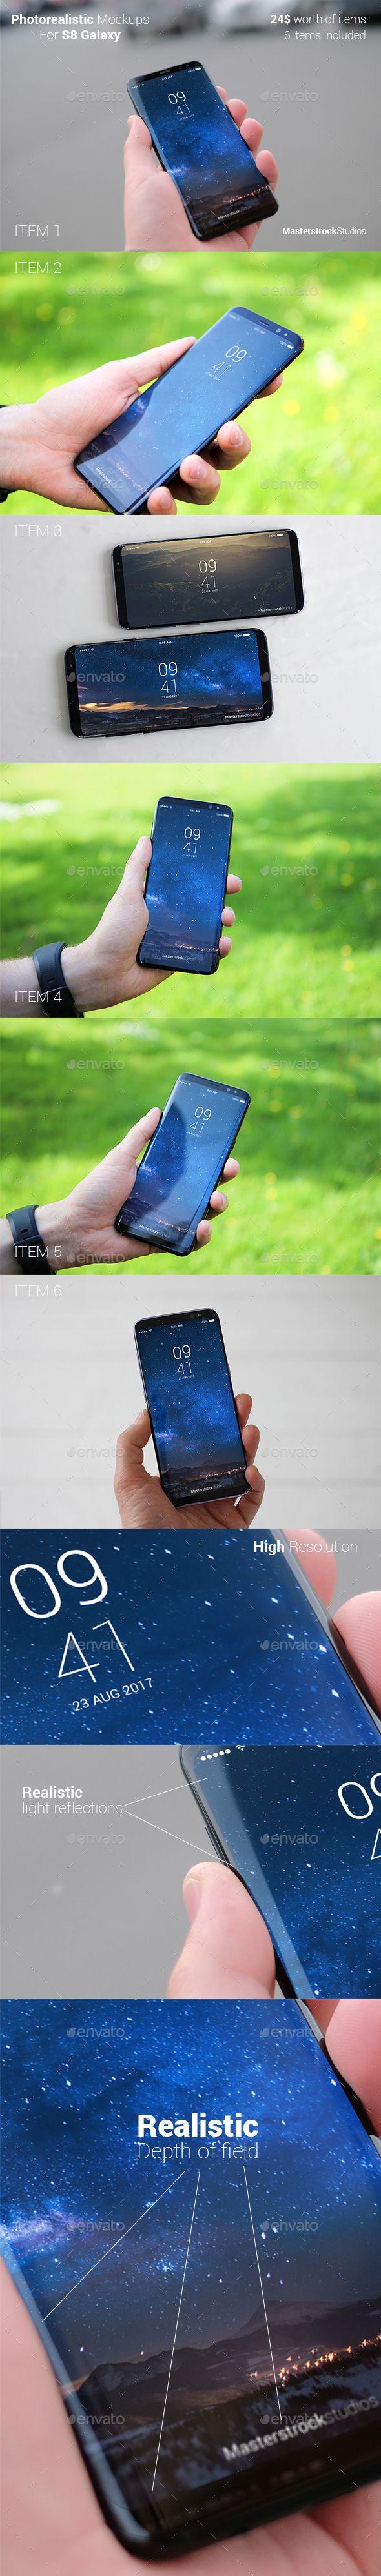 Bundle - 6 Photorealistic S8 Phone Mockups - Mobile Displays